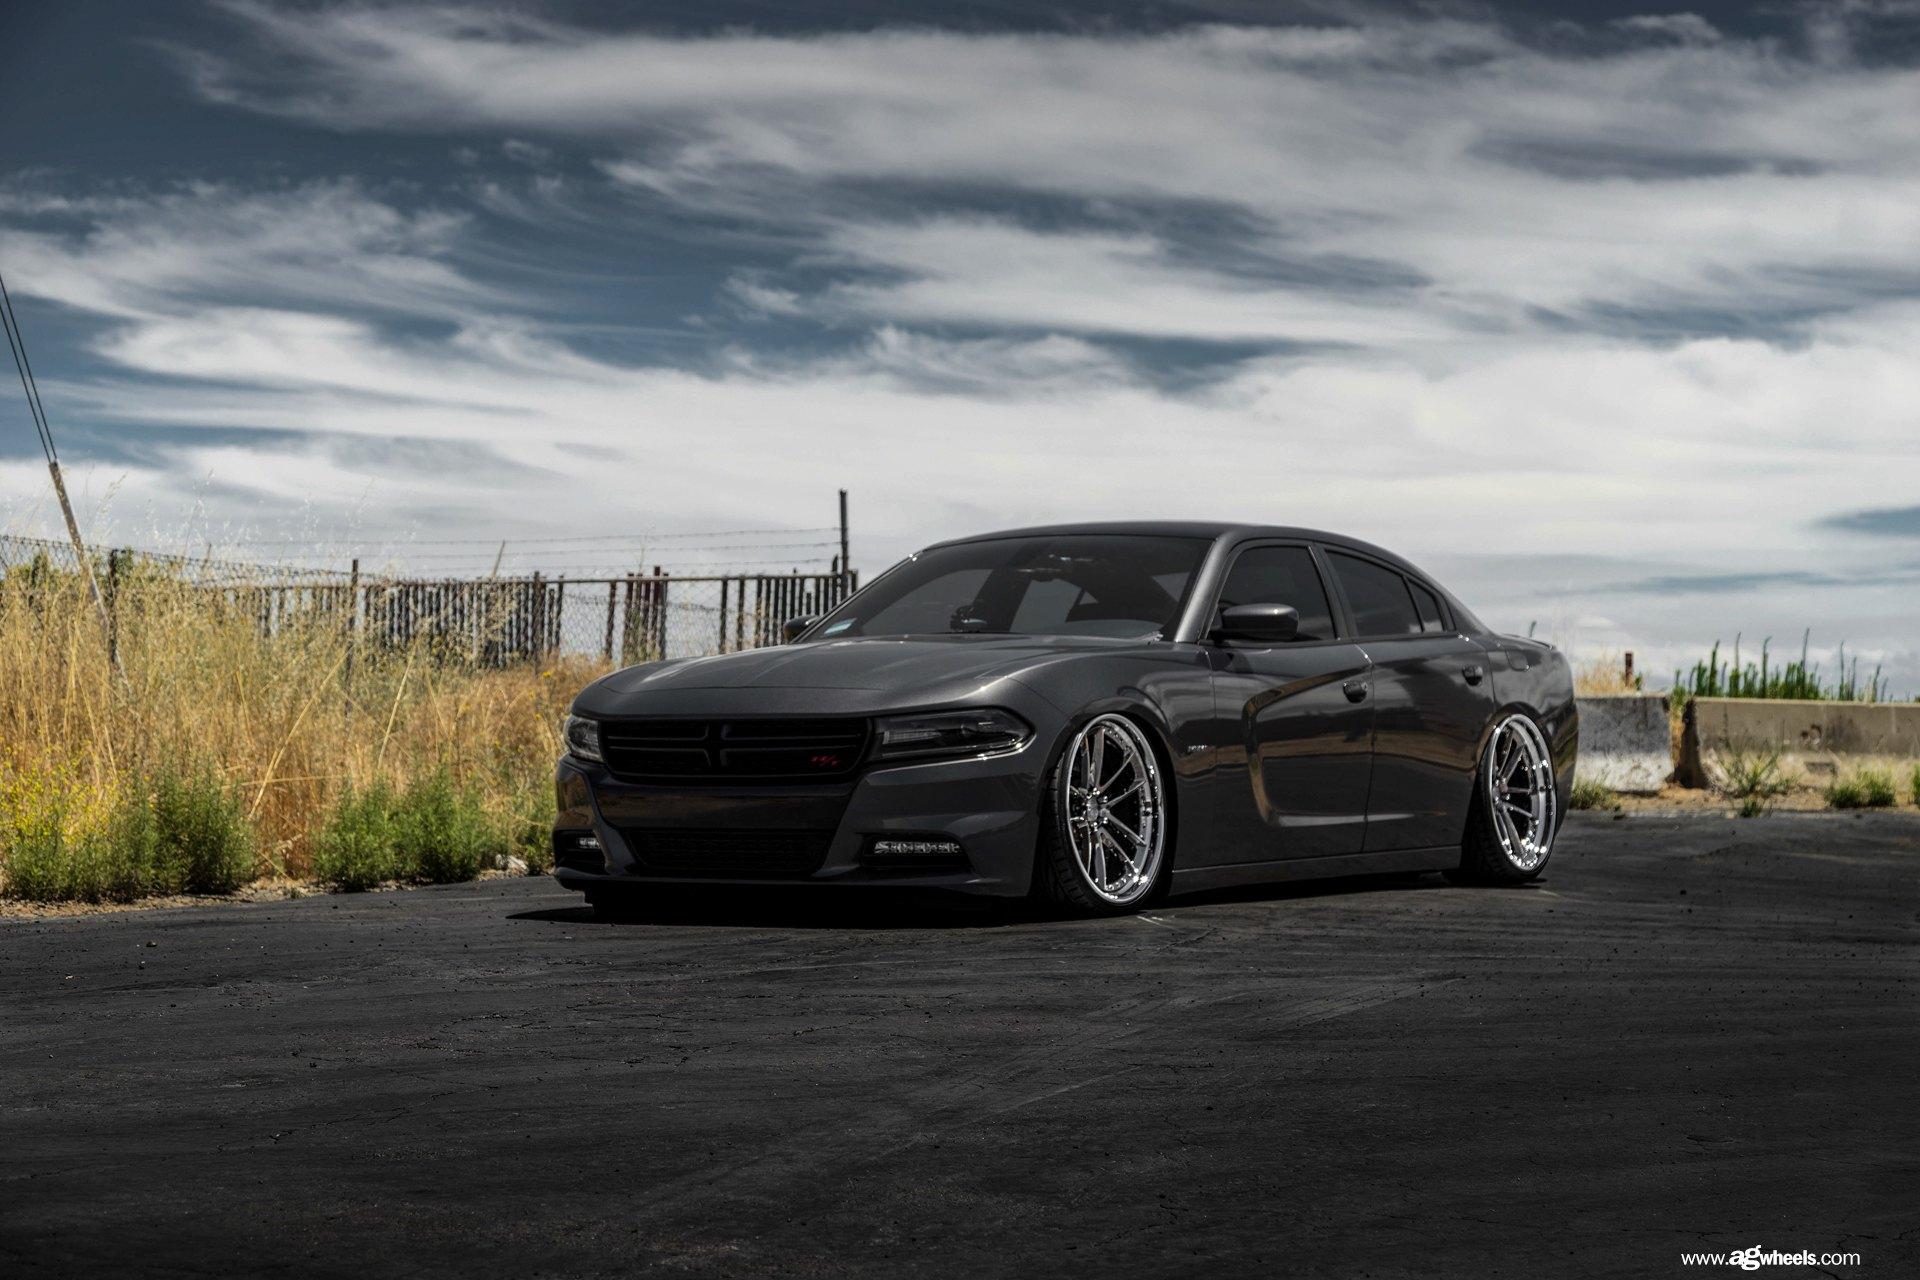 Graphite Black Charger R T On Chrome Rims By Avant Garde